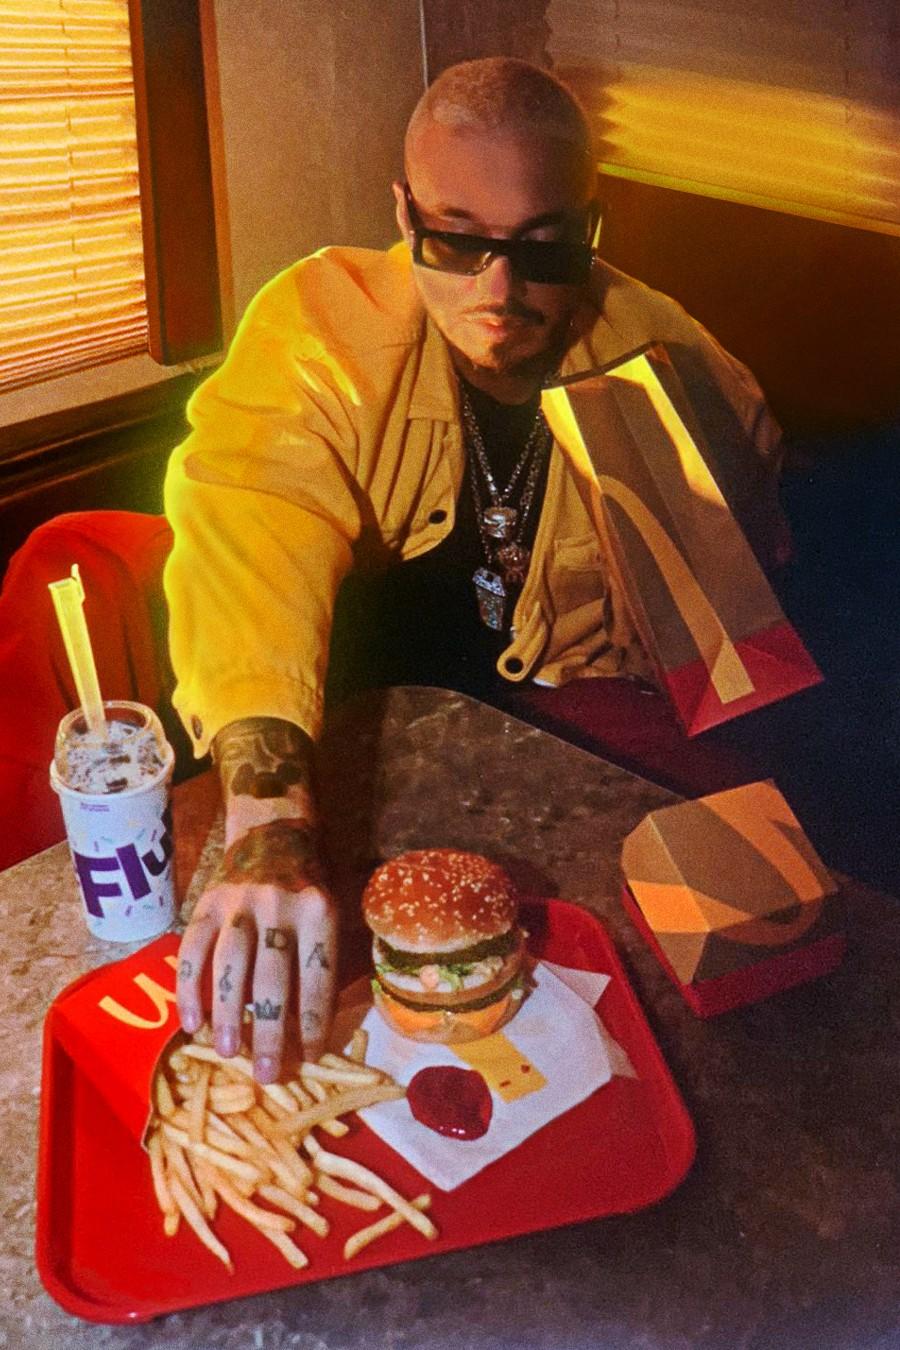 https___hypebeast.com_image_2020_10_j-balvin-mcdonalds-artist-meal-menu-collaboration-big-mac-oreo-mcflurry-medium-french-fries-5